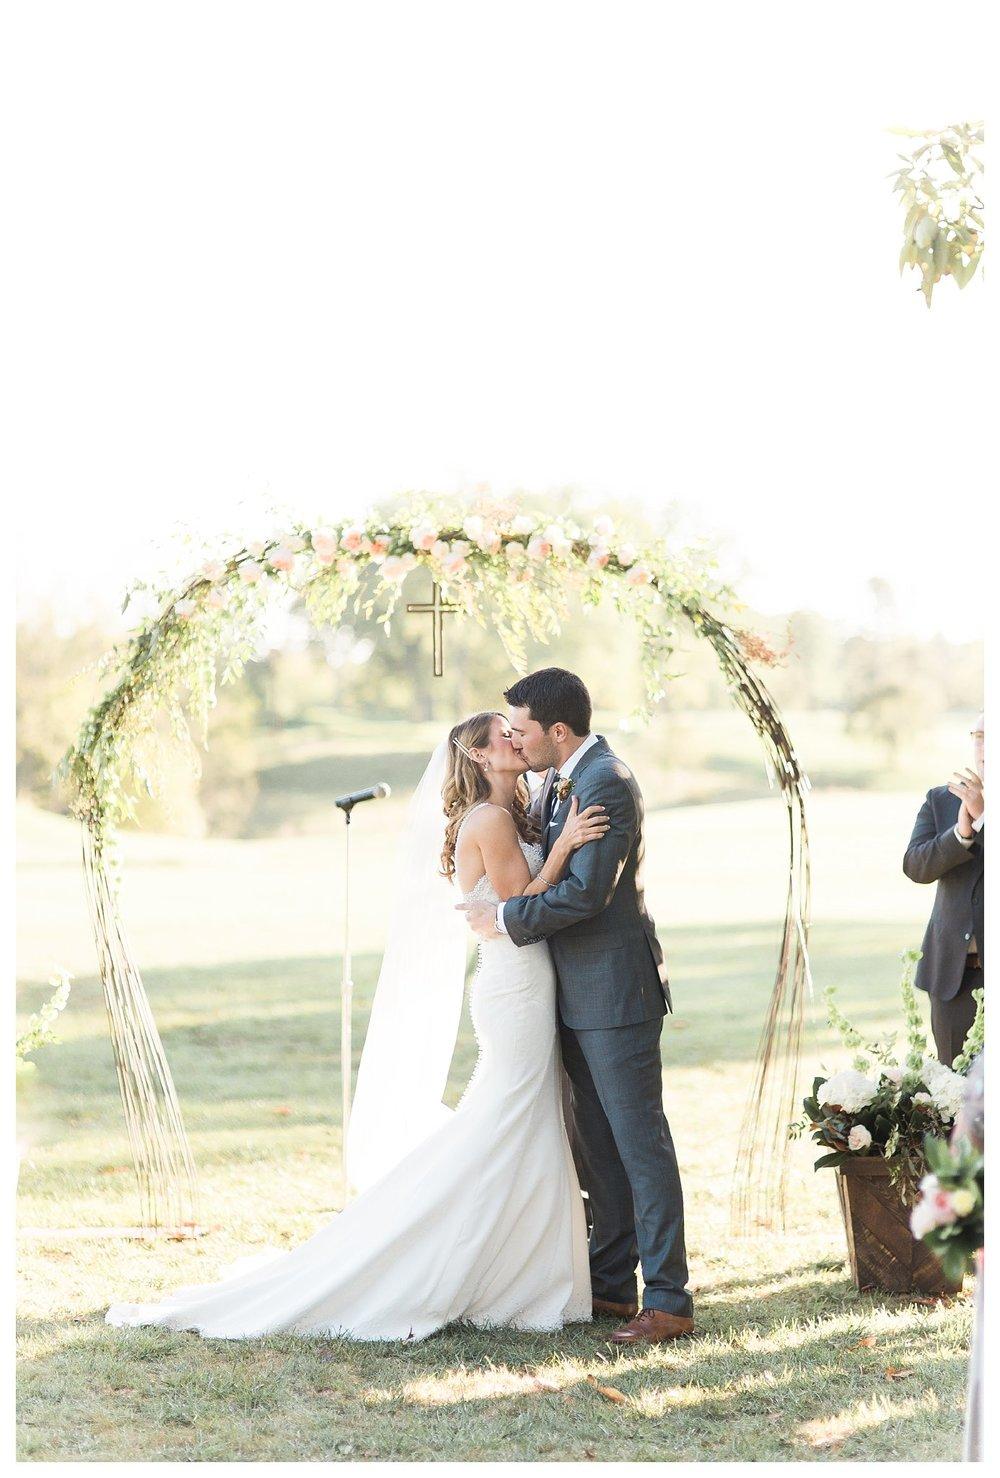 everleighphotography-cincinnati-wedding-photographer-northern-kentucky-wedding-photographer-camargo-country-club-the-karsh-wedding-34